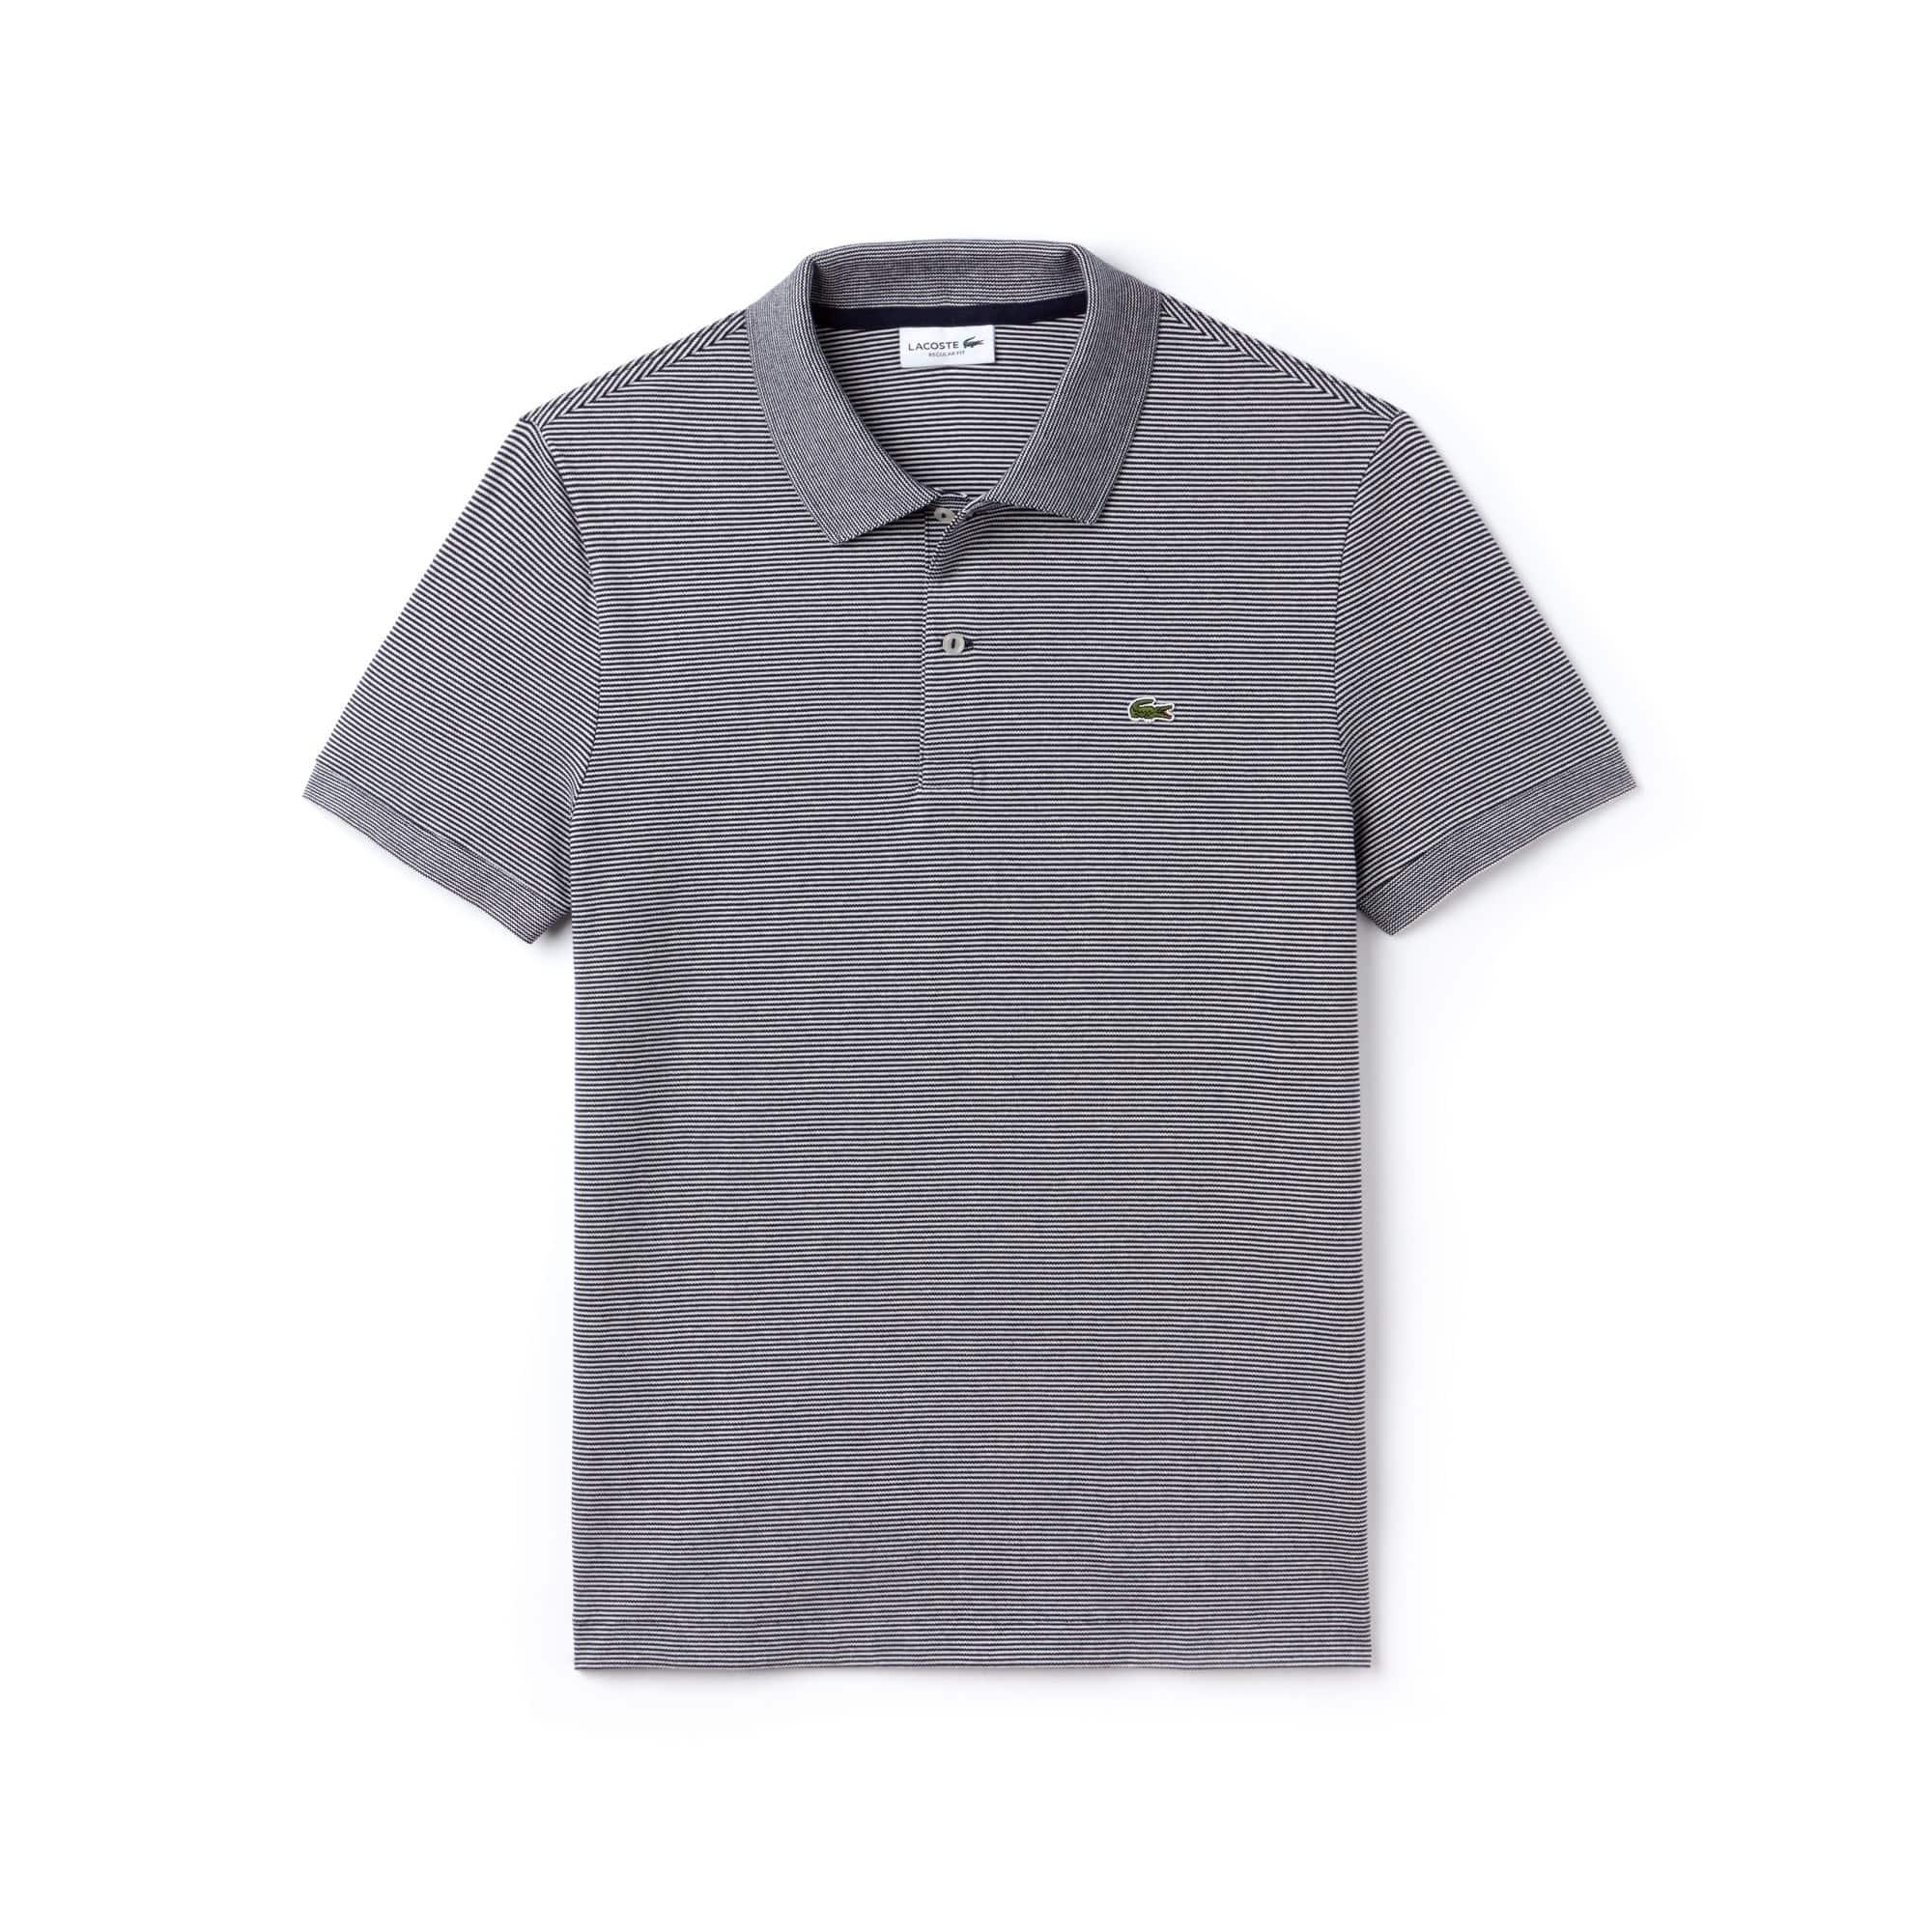 Regular Fit Herren-Poloshirt aus gestreiftem Mini-Piqué LACOSTE